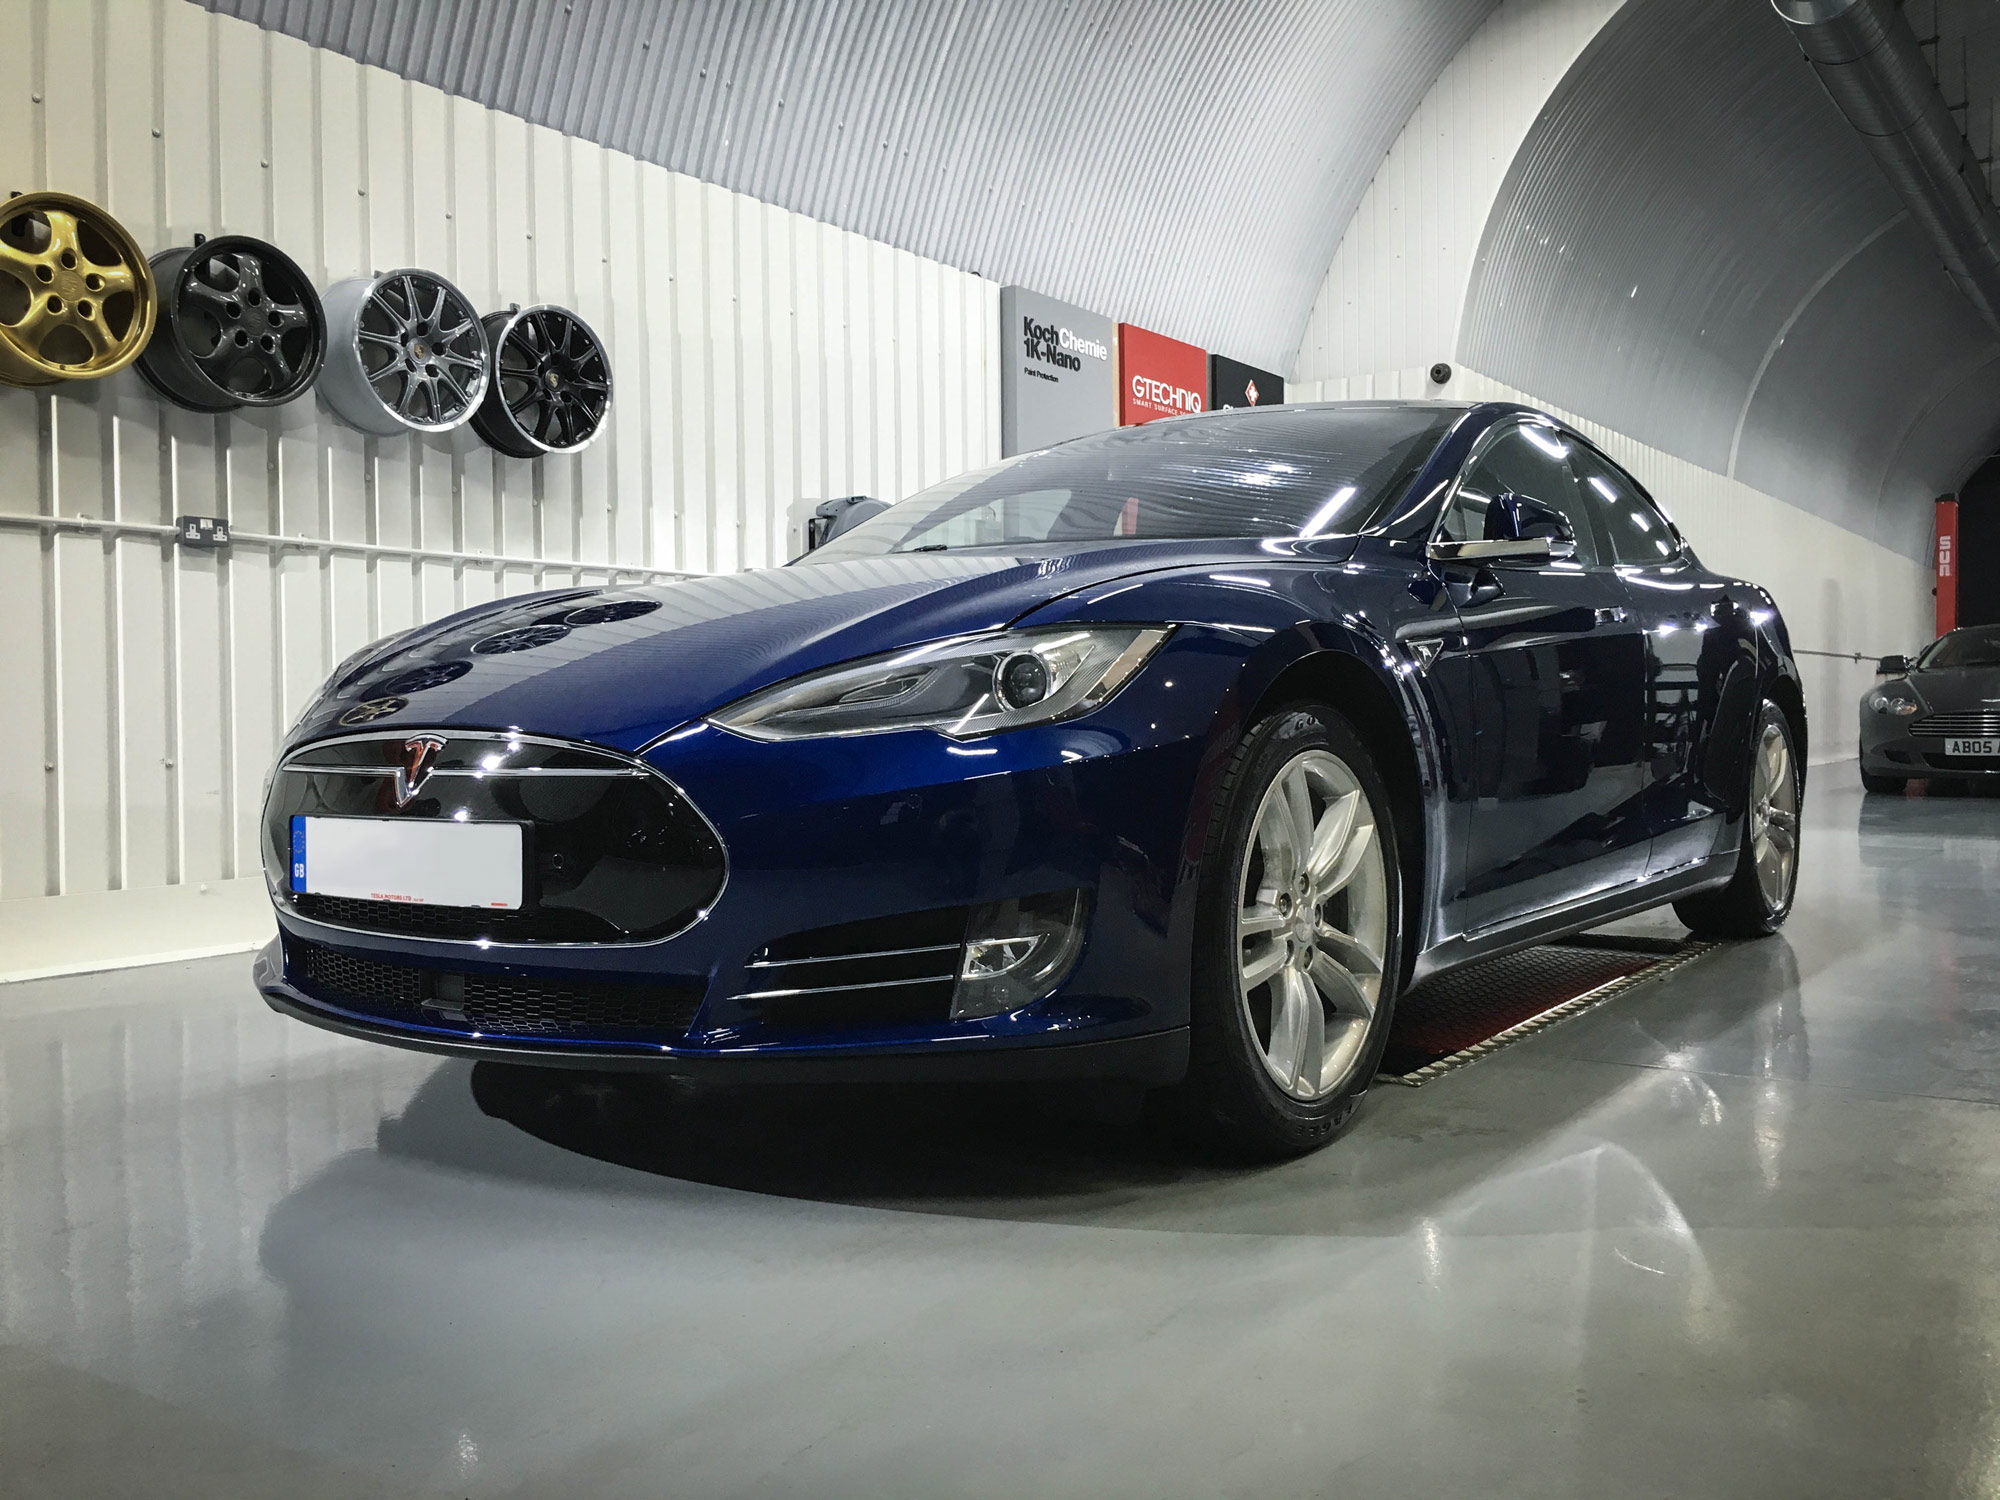 Tesla_Model_S-front-passeners-side